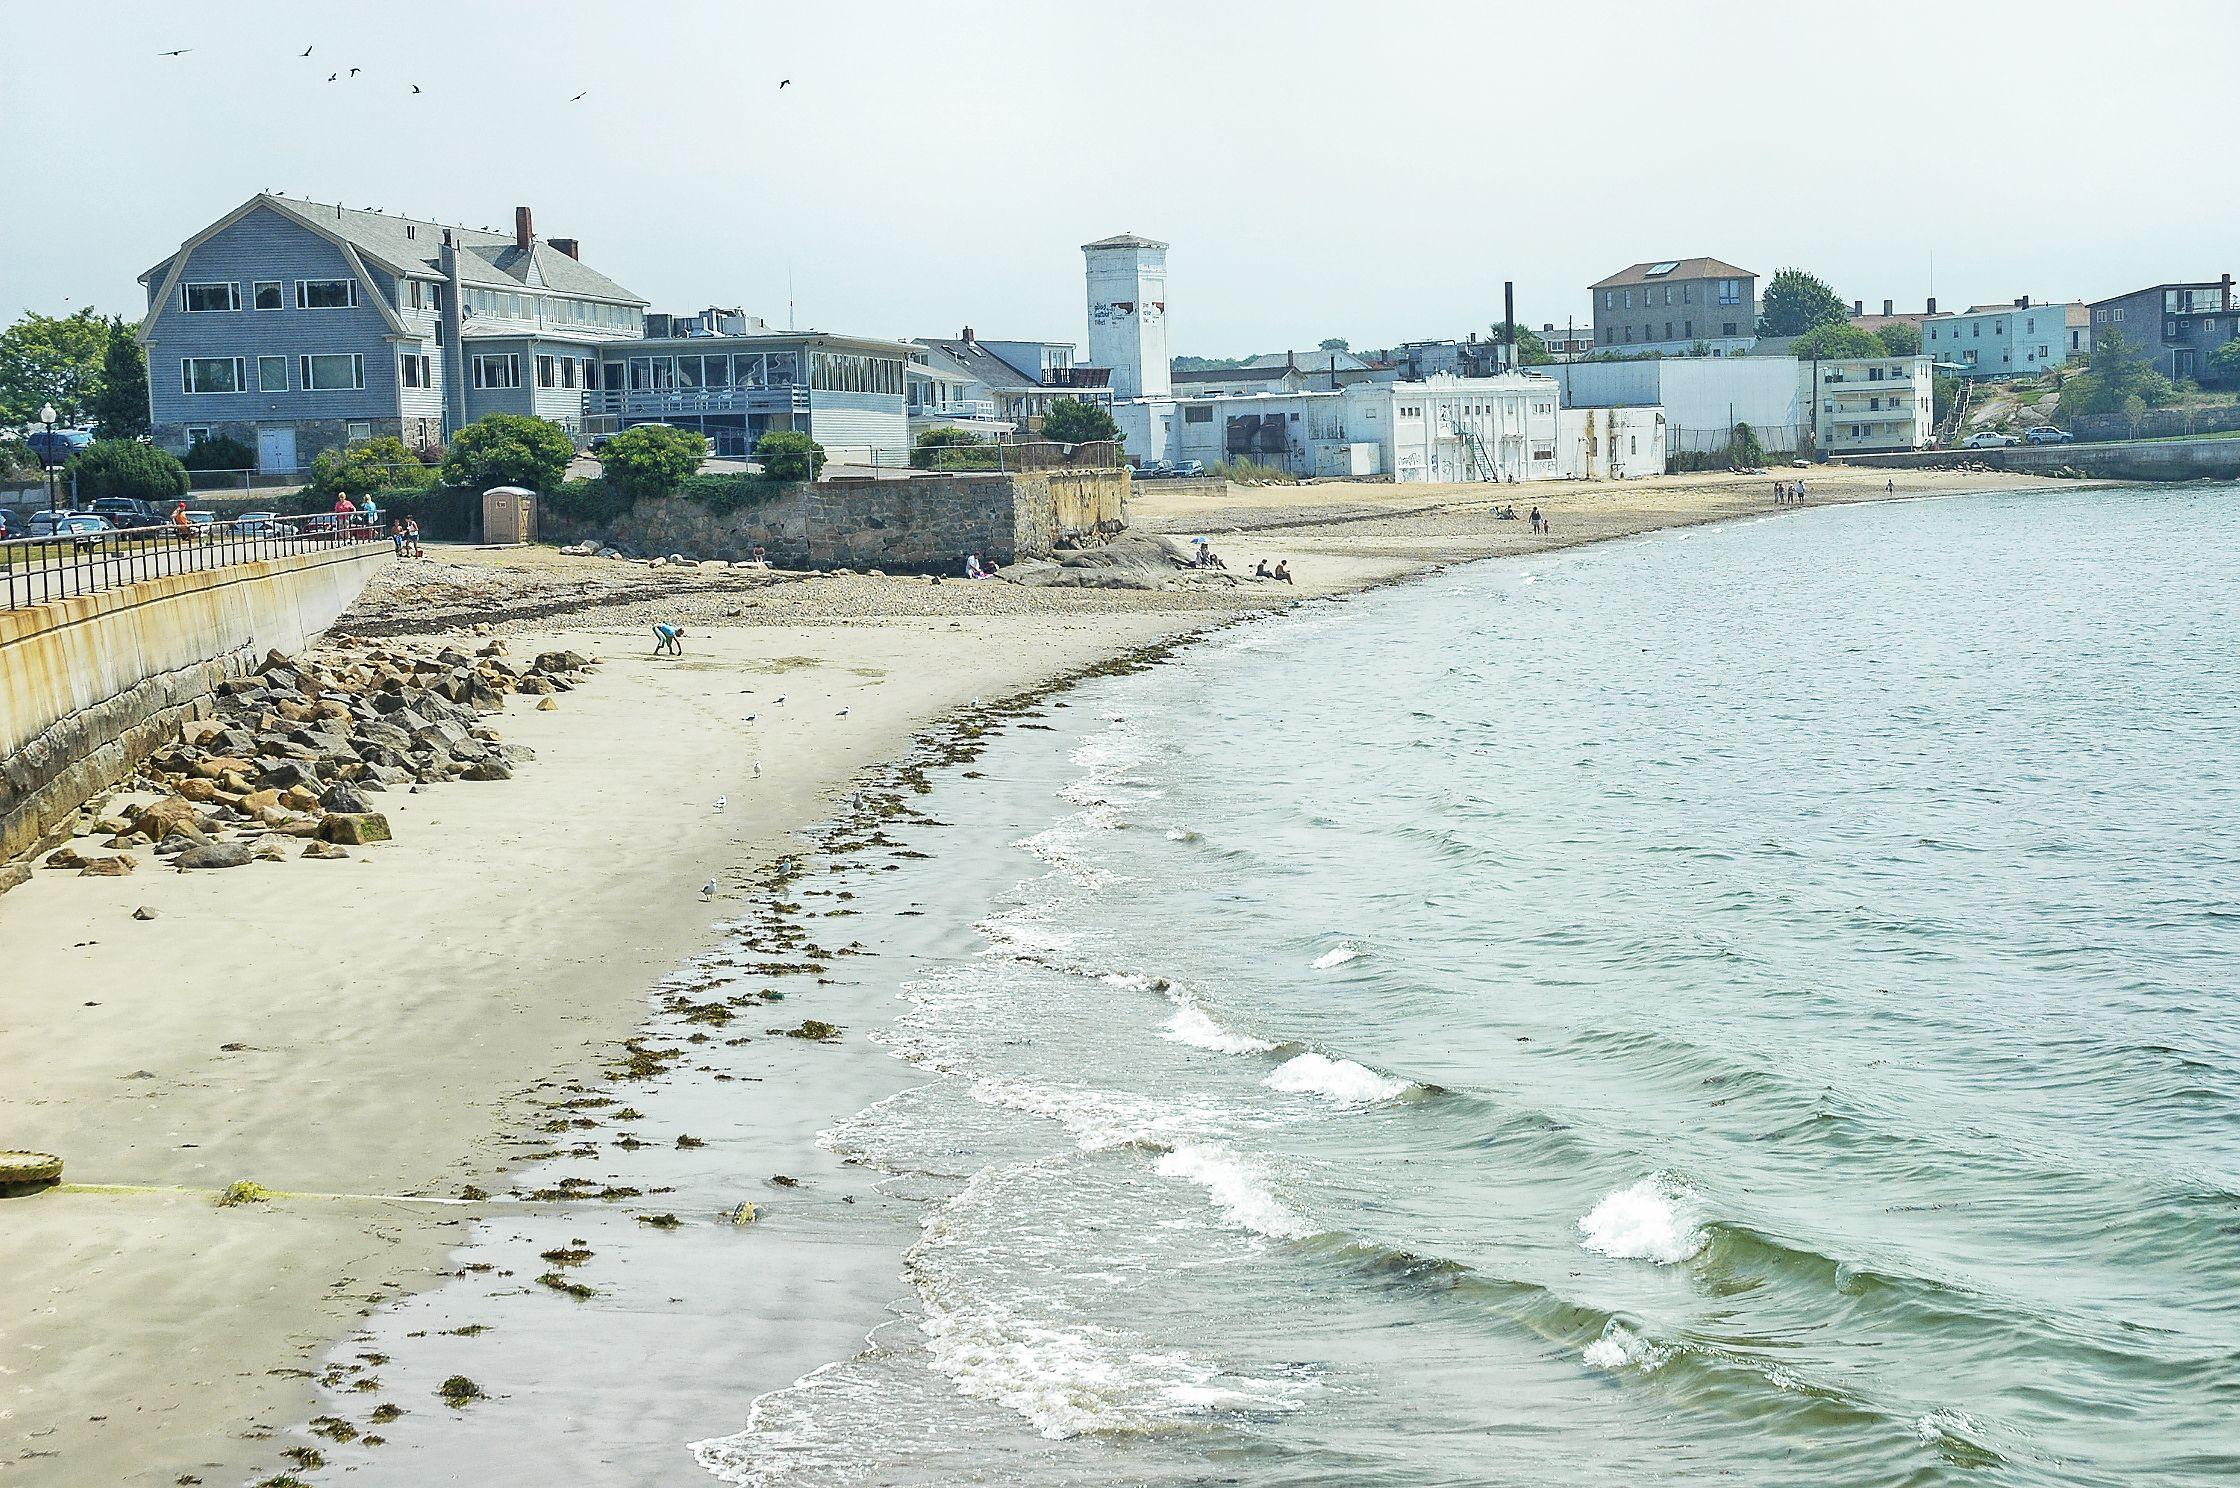 Gloucester Massachusetts shore line with beach